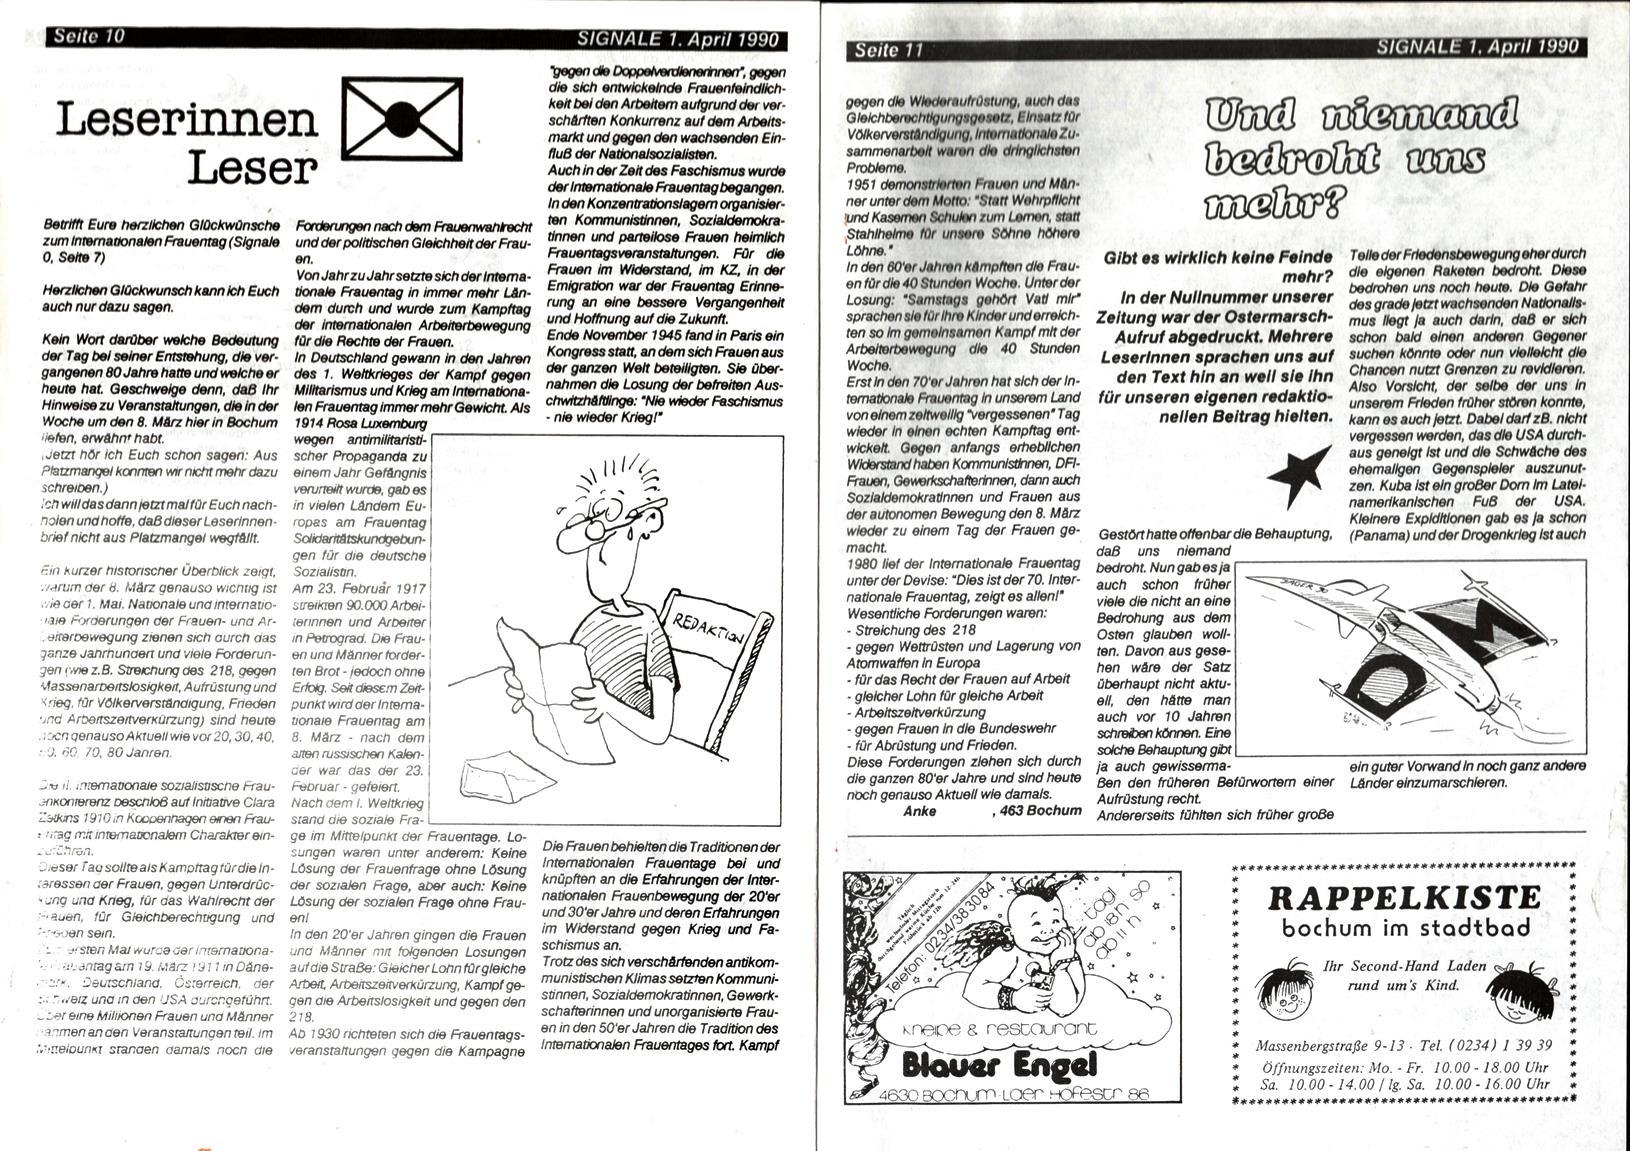 Bochum_SDAJ_Signale_19900400_006